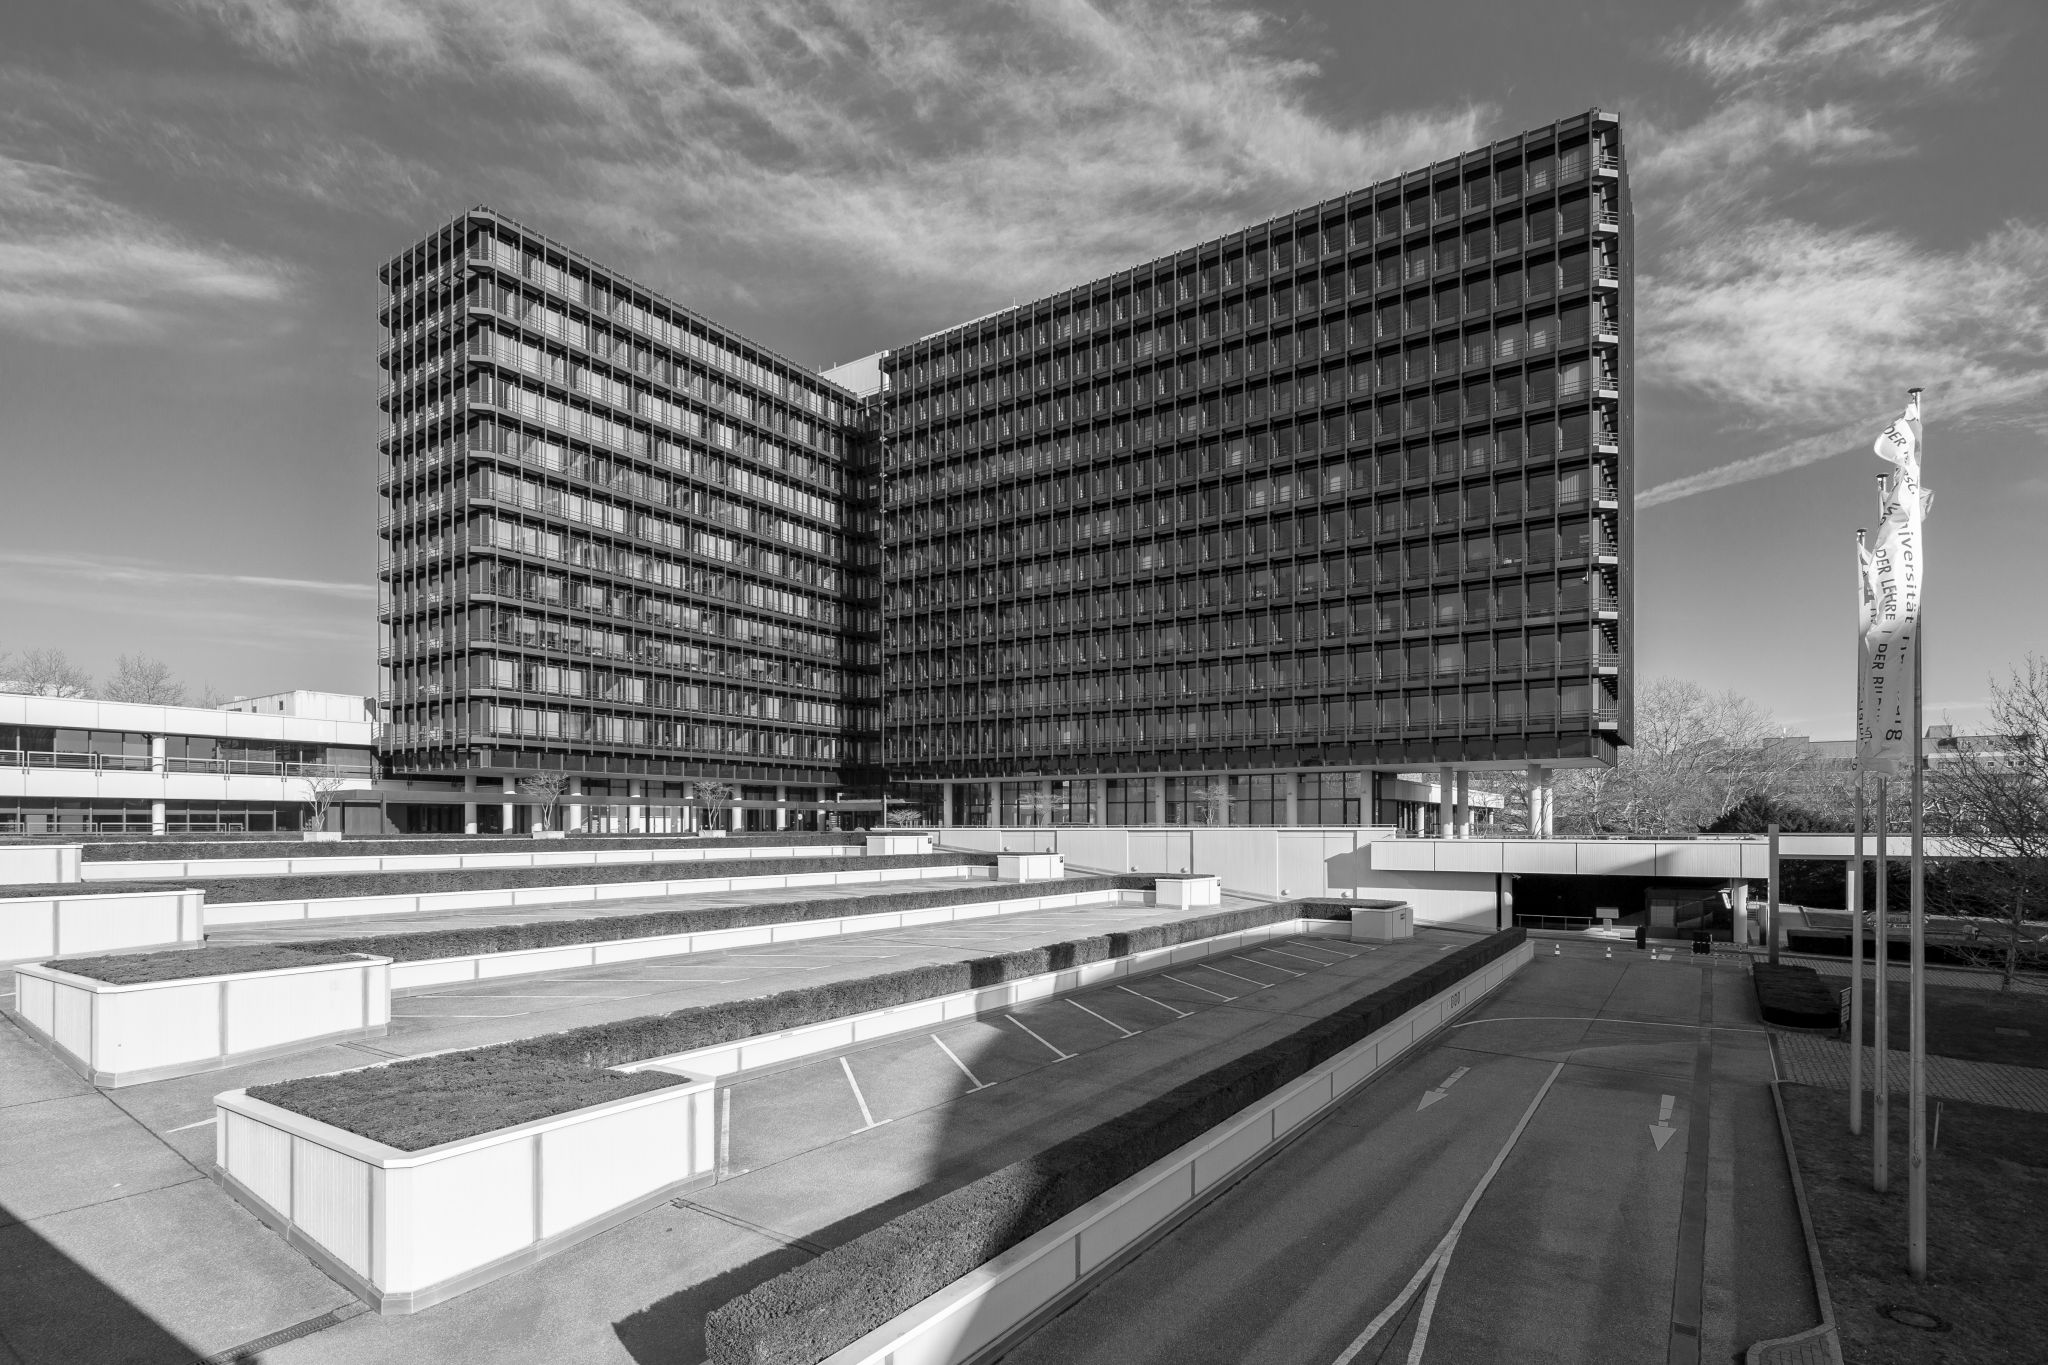 City Nord Hamburg Überseering 35, Germany